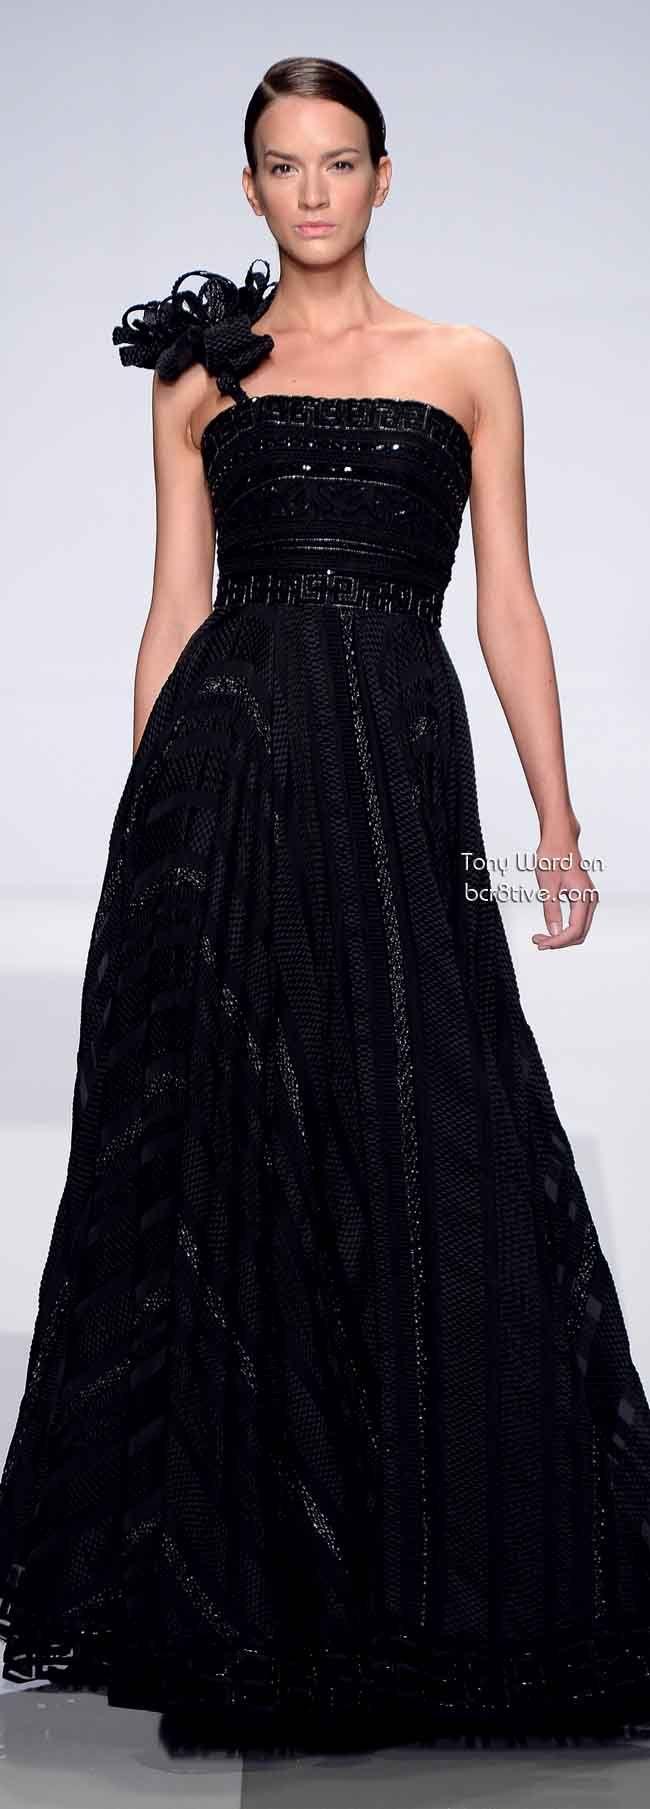 best black wedding images on pinterest black gowns